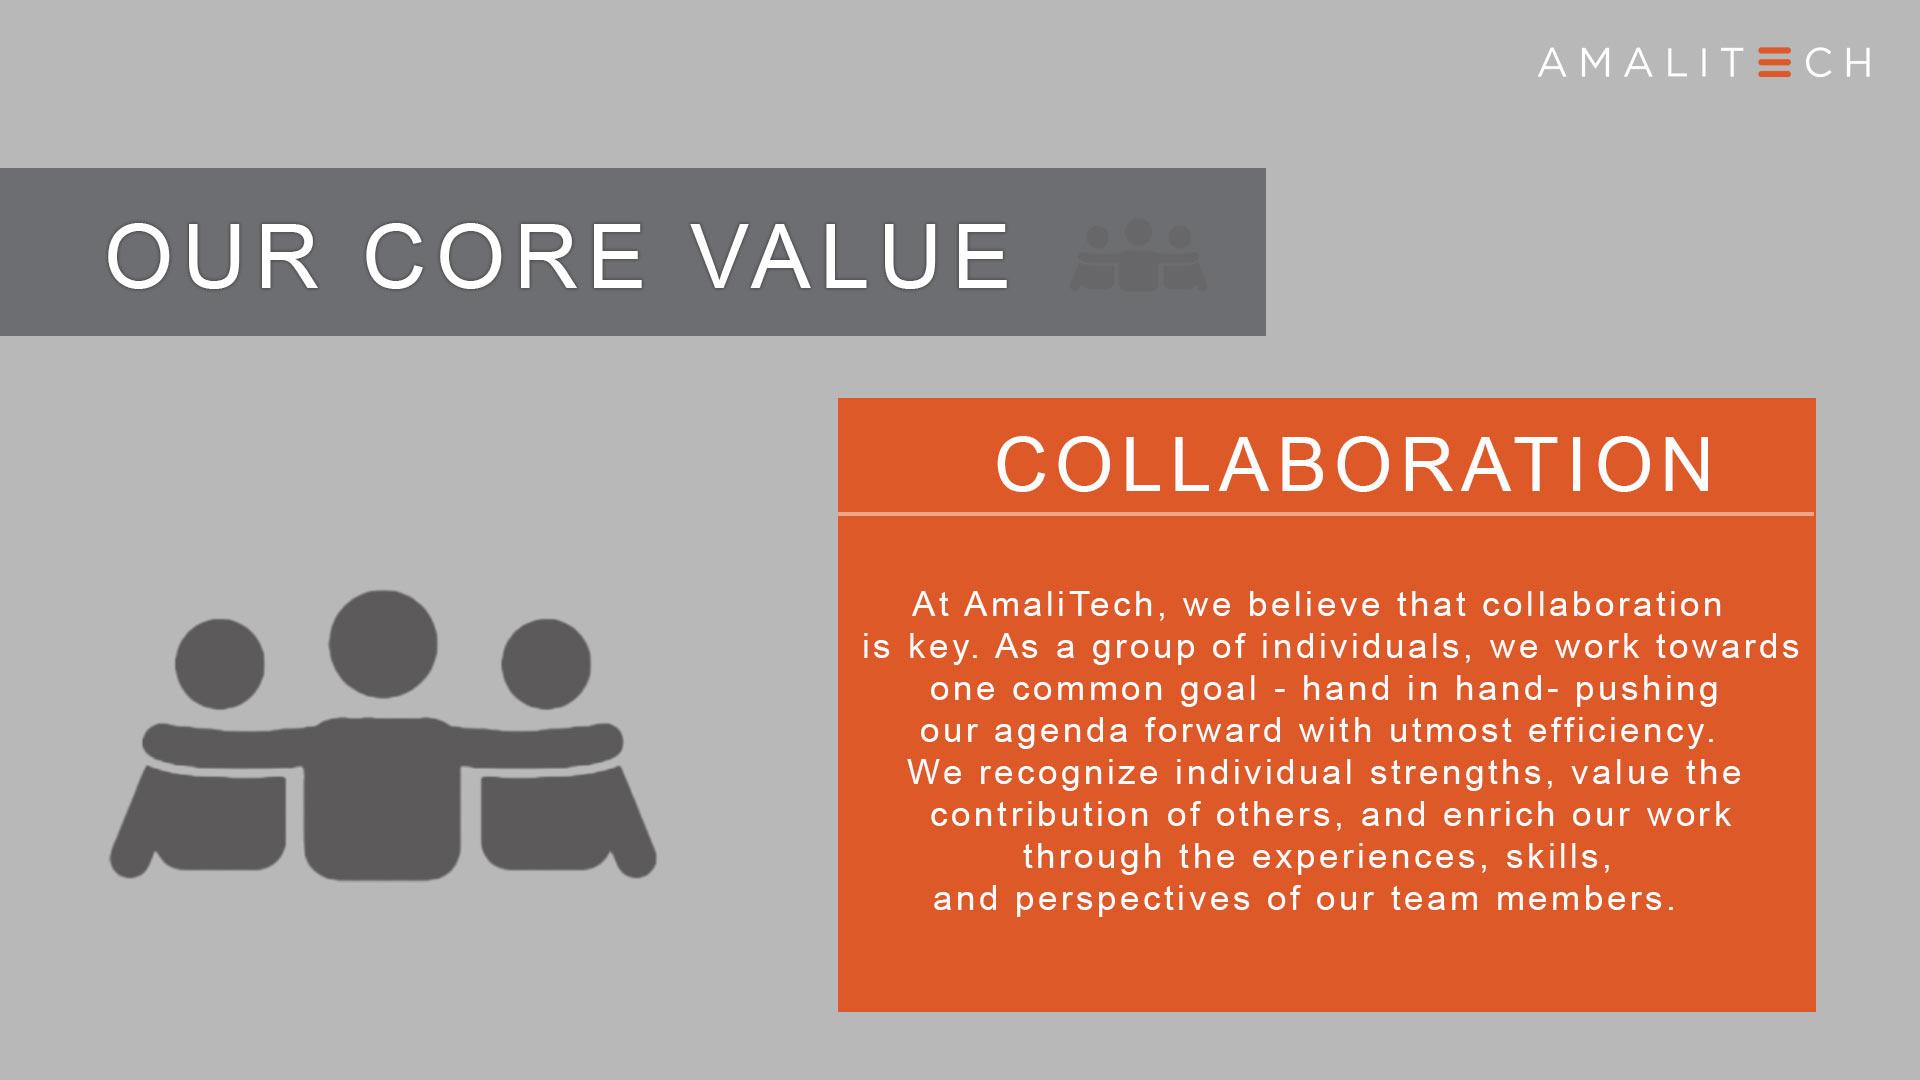 Core Value of Collaboration